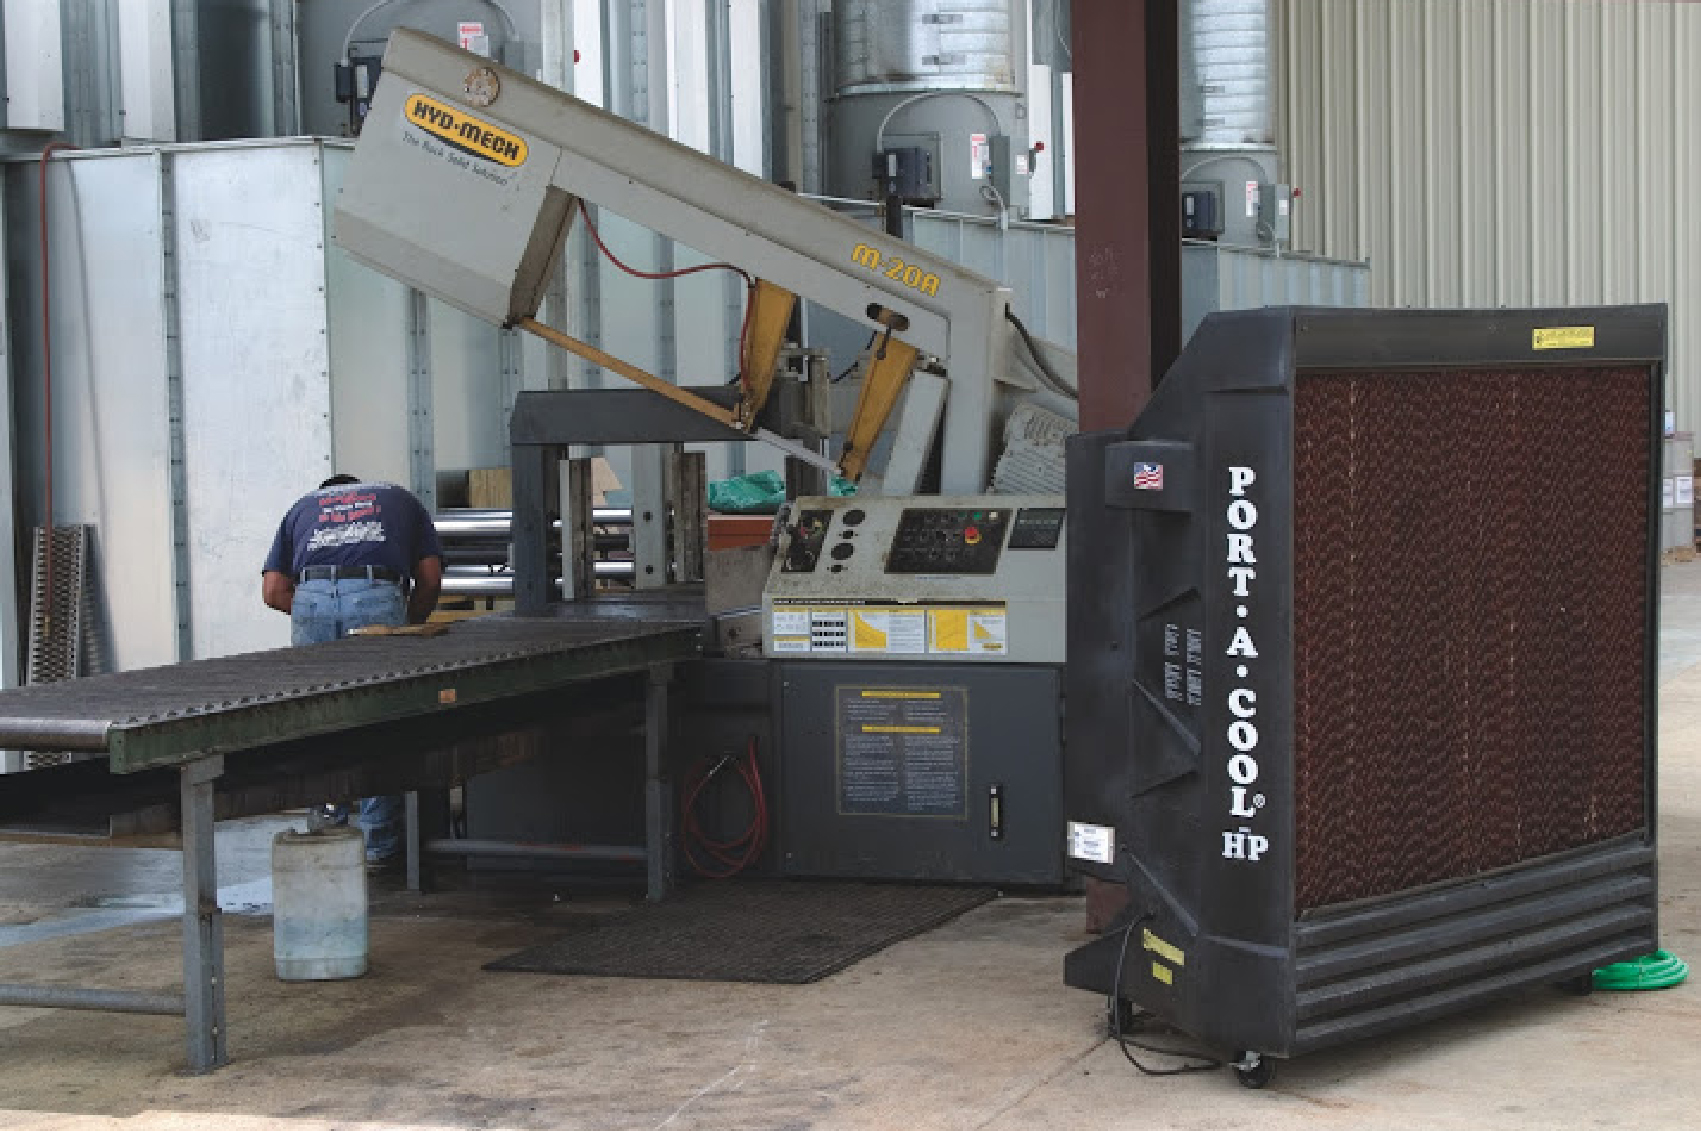 Port A Cool 36 Machinekoeling